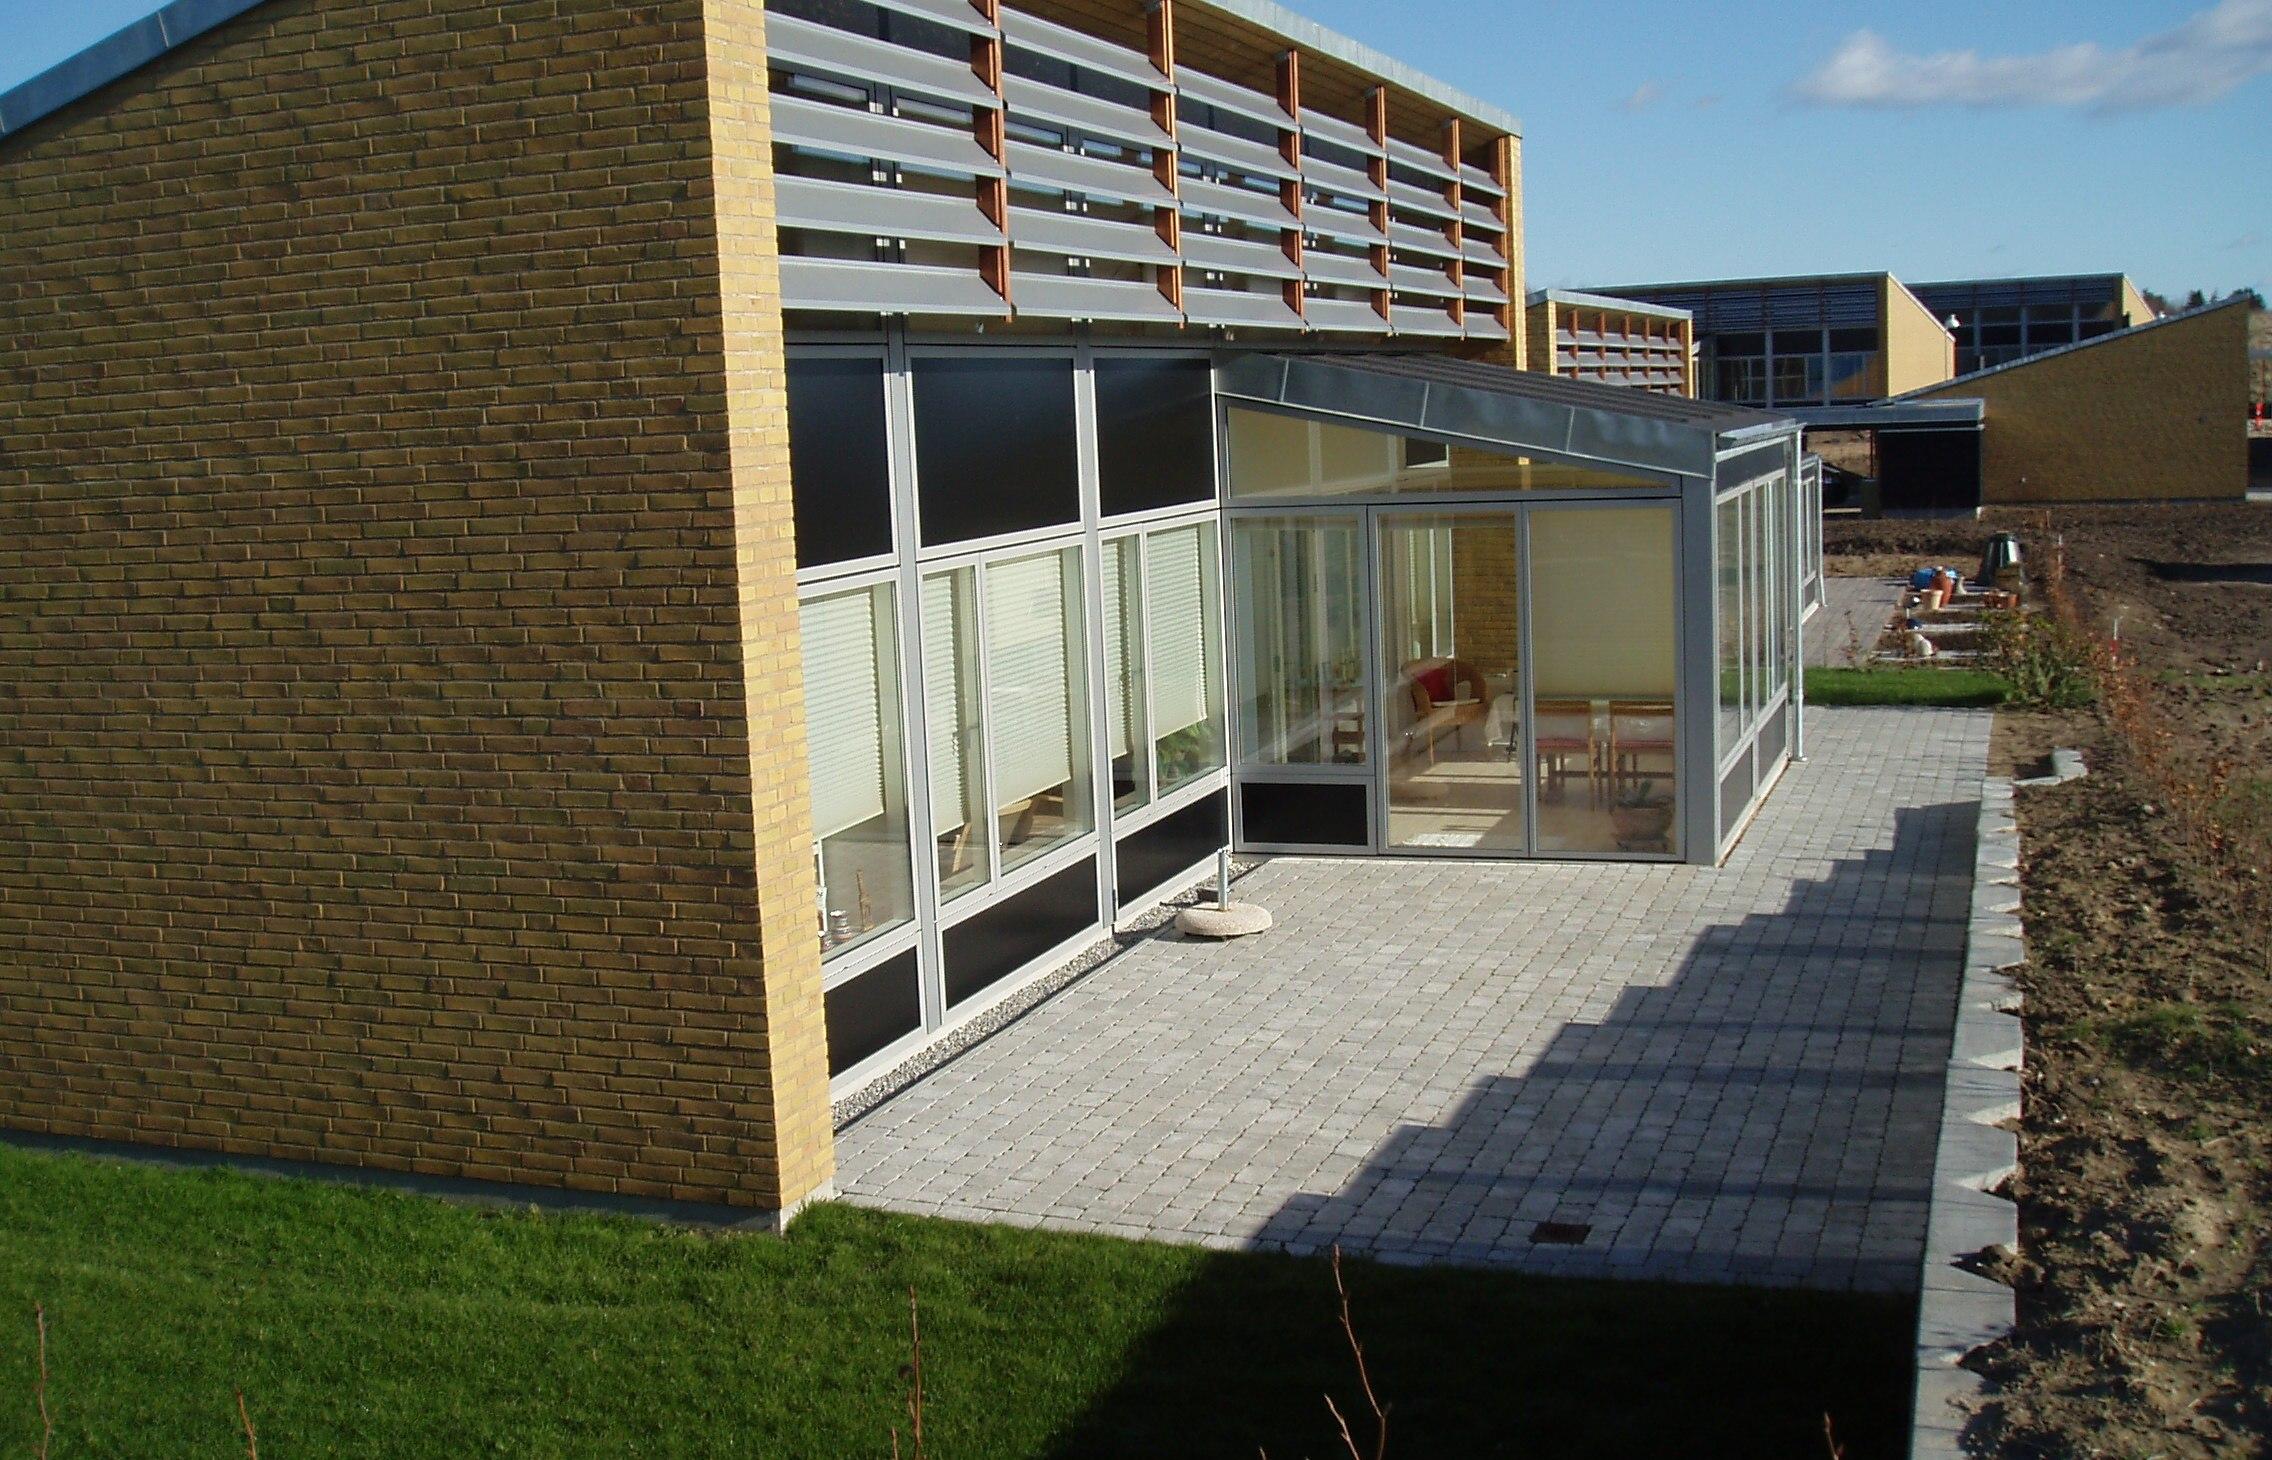 http://ta-as.dk/wp-content/uploads/2012/11/Grævlingehøjen-Hammel.-30-boliger-21.jpg